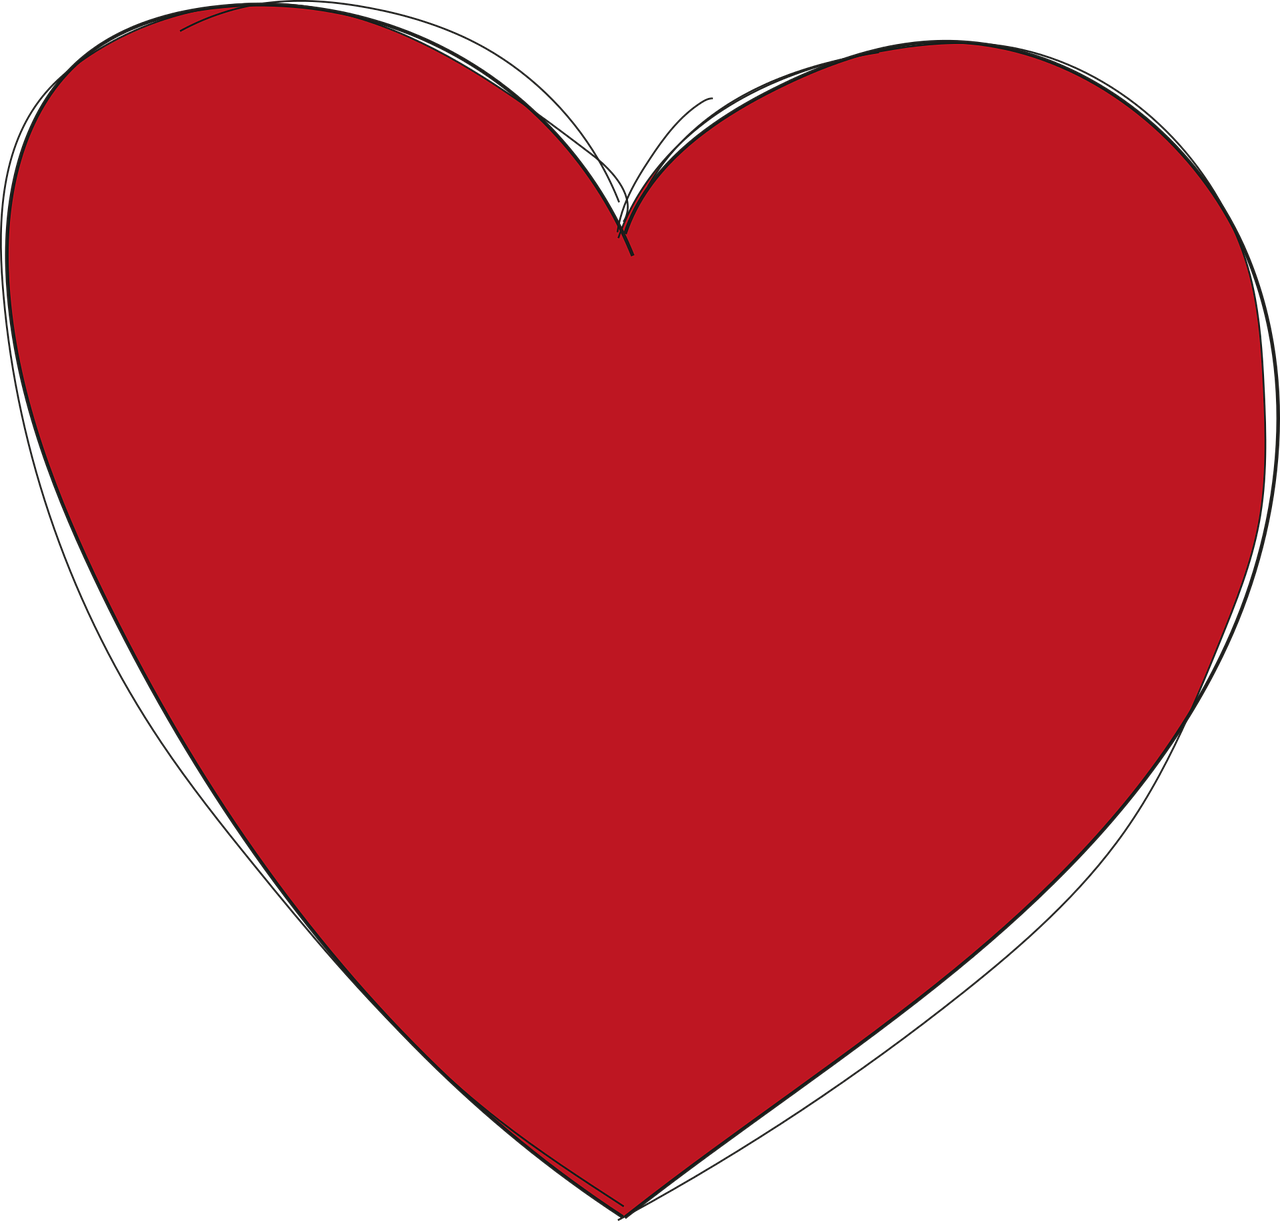 heart-1777681_1280